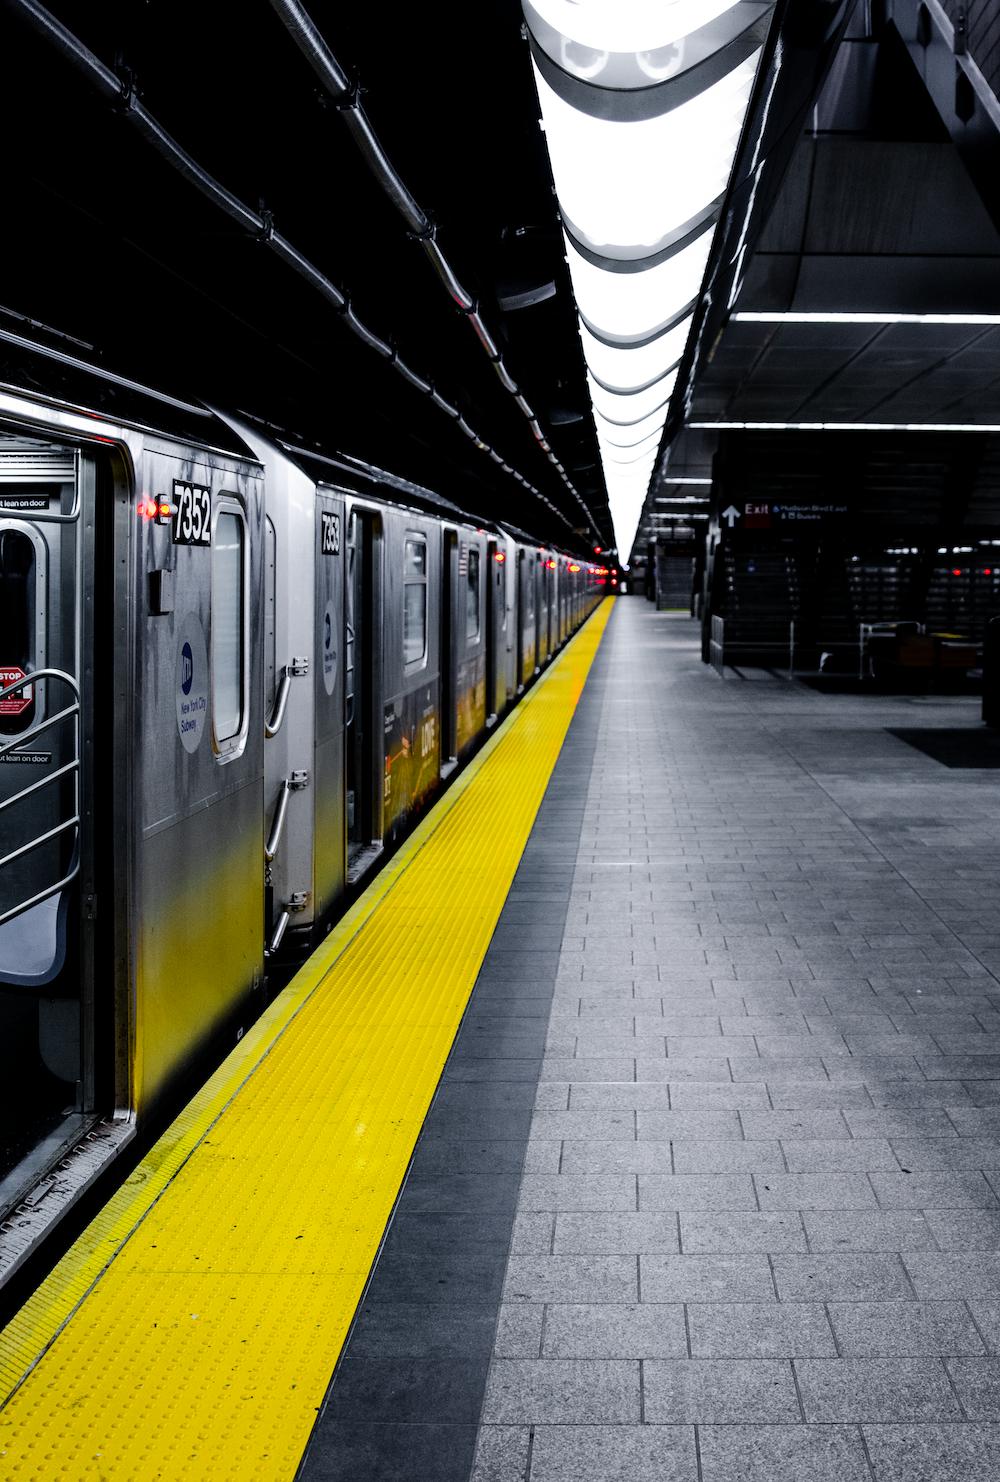 grey train in subway